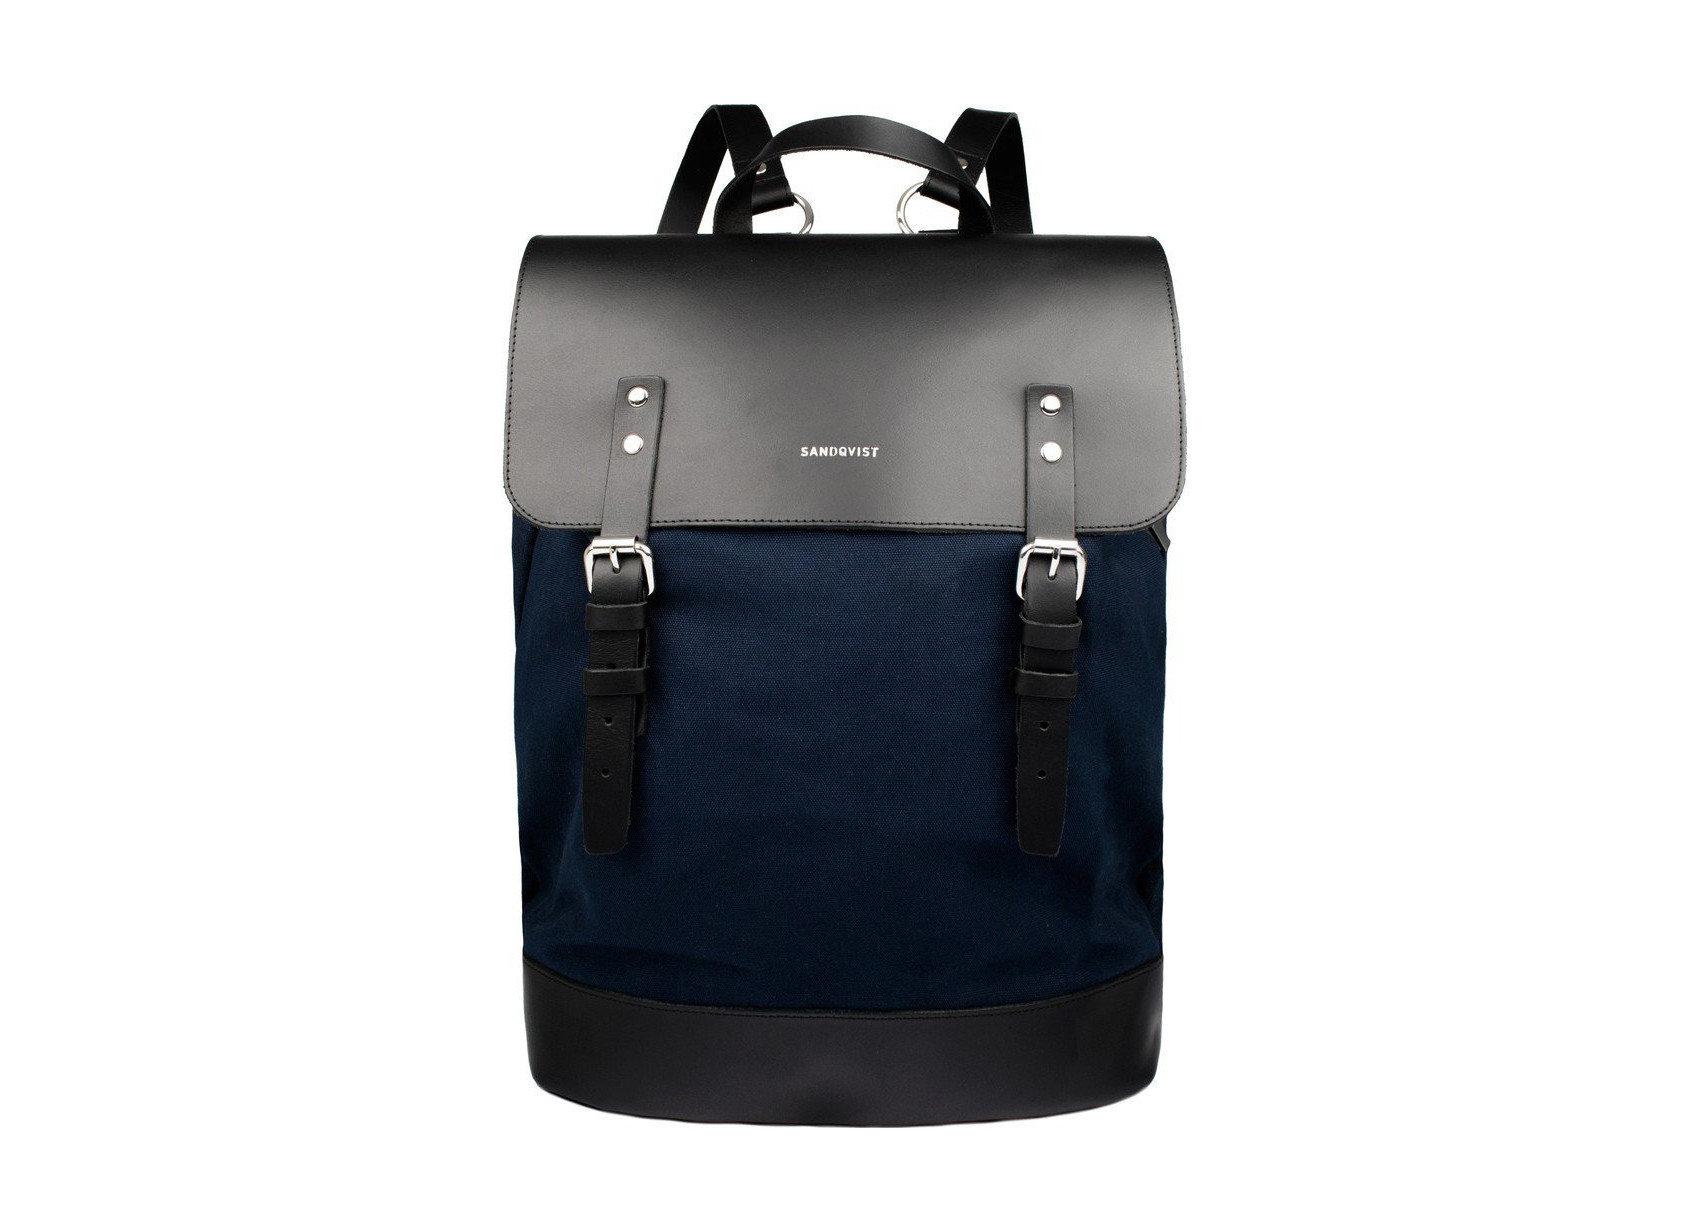 Travel Shop accessory bag suitcase product indoor black electric blue case handbag product design shoulder bag brand baggage luggage & bags leather hand luggage